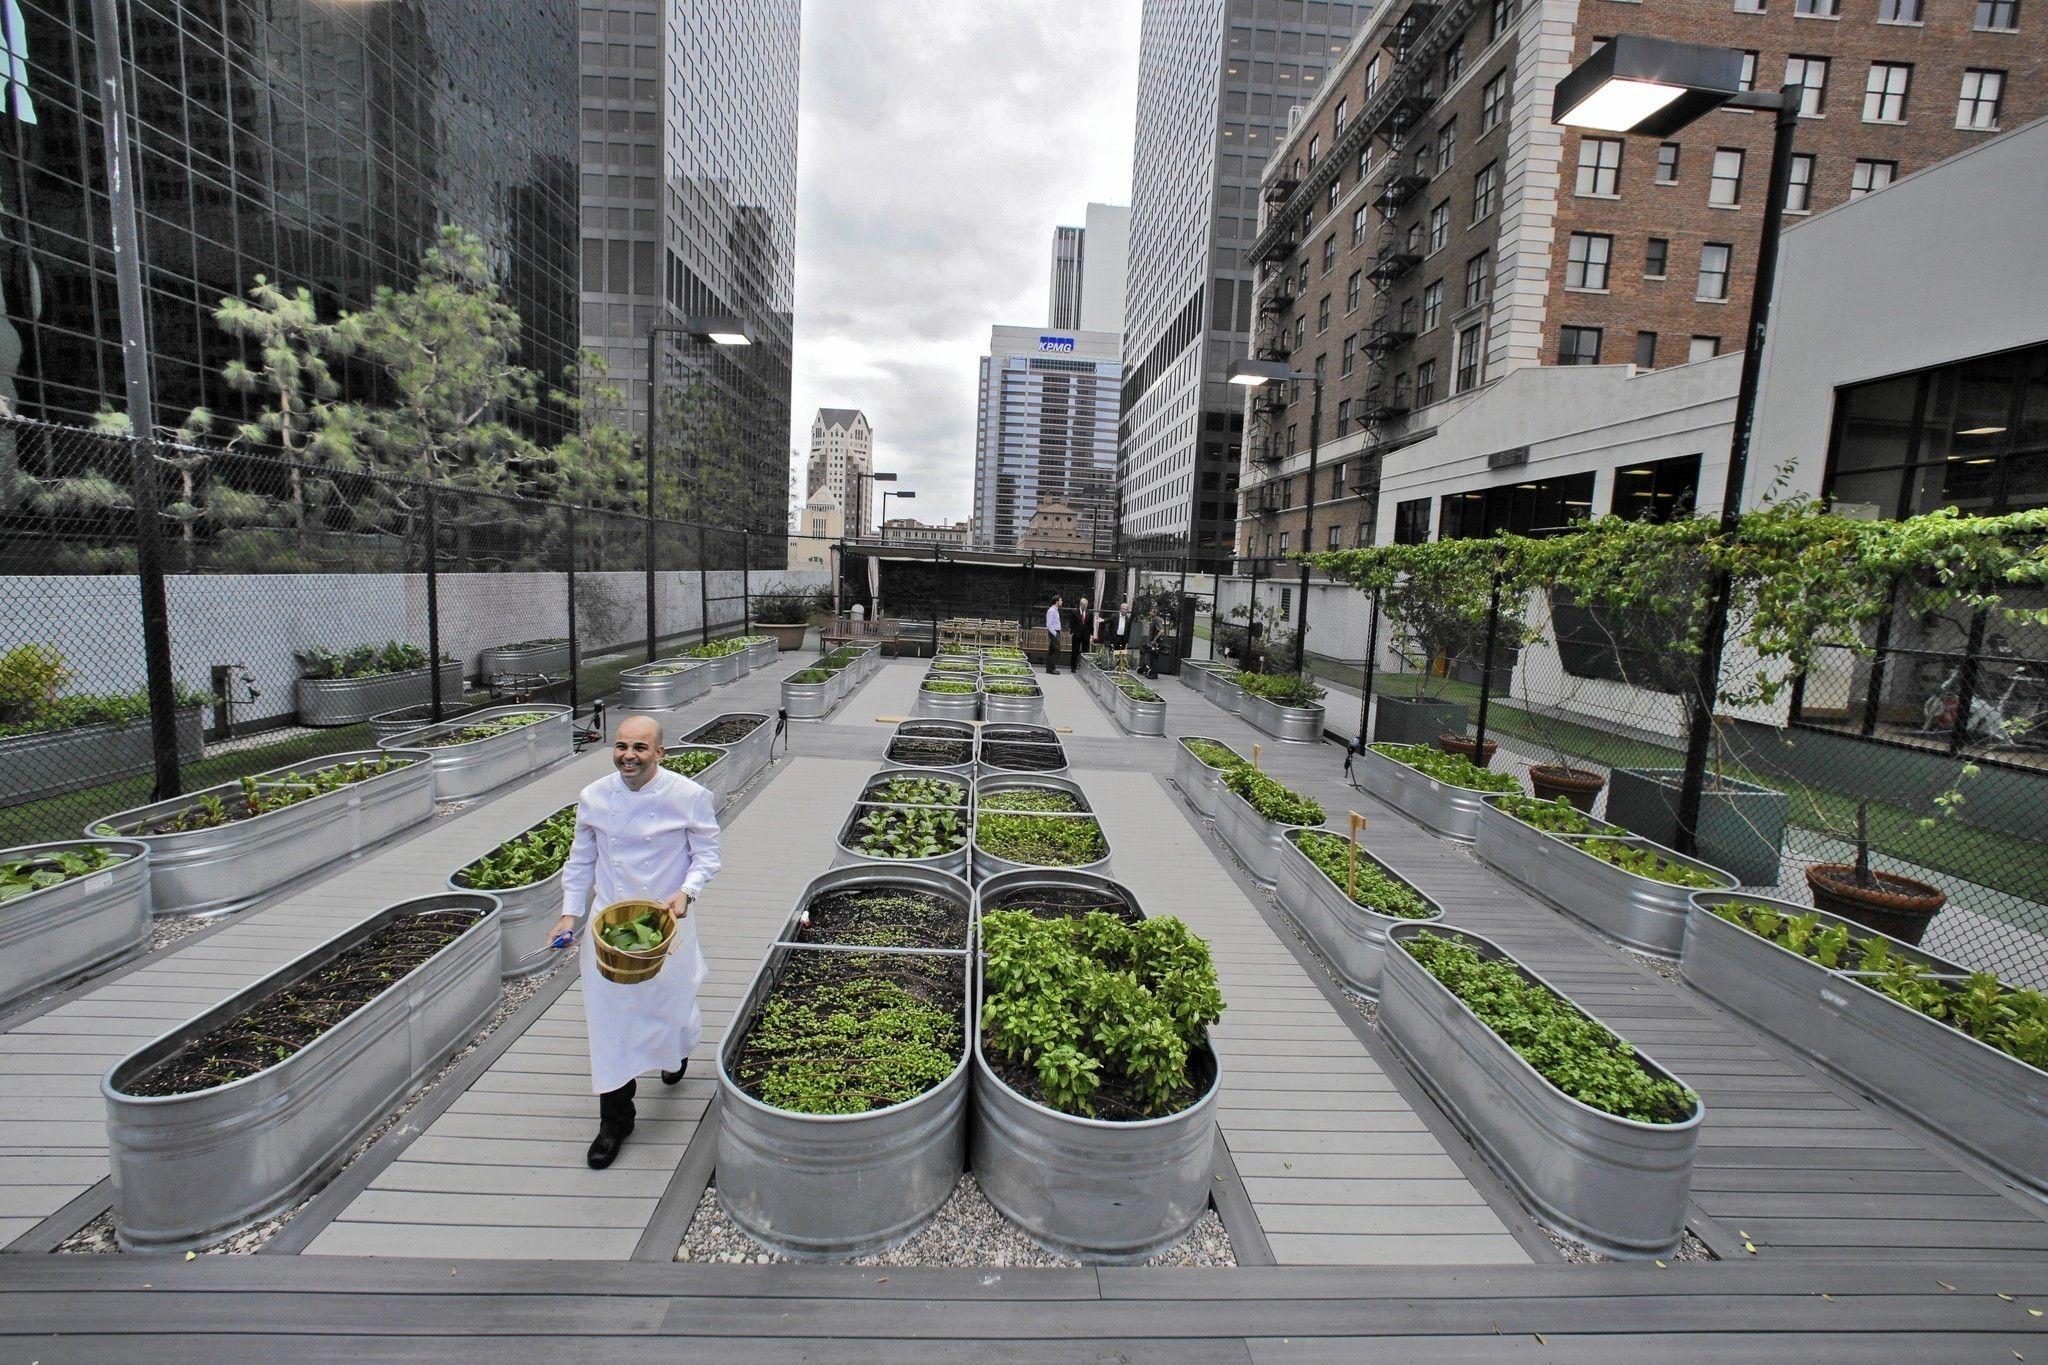 Pin By Kendra Luck On Yard Dreams Growing Food Pinterest Urban